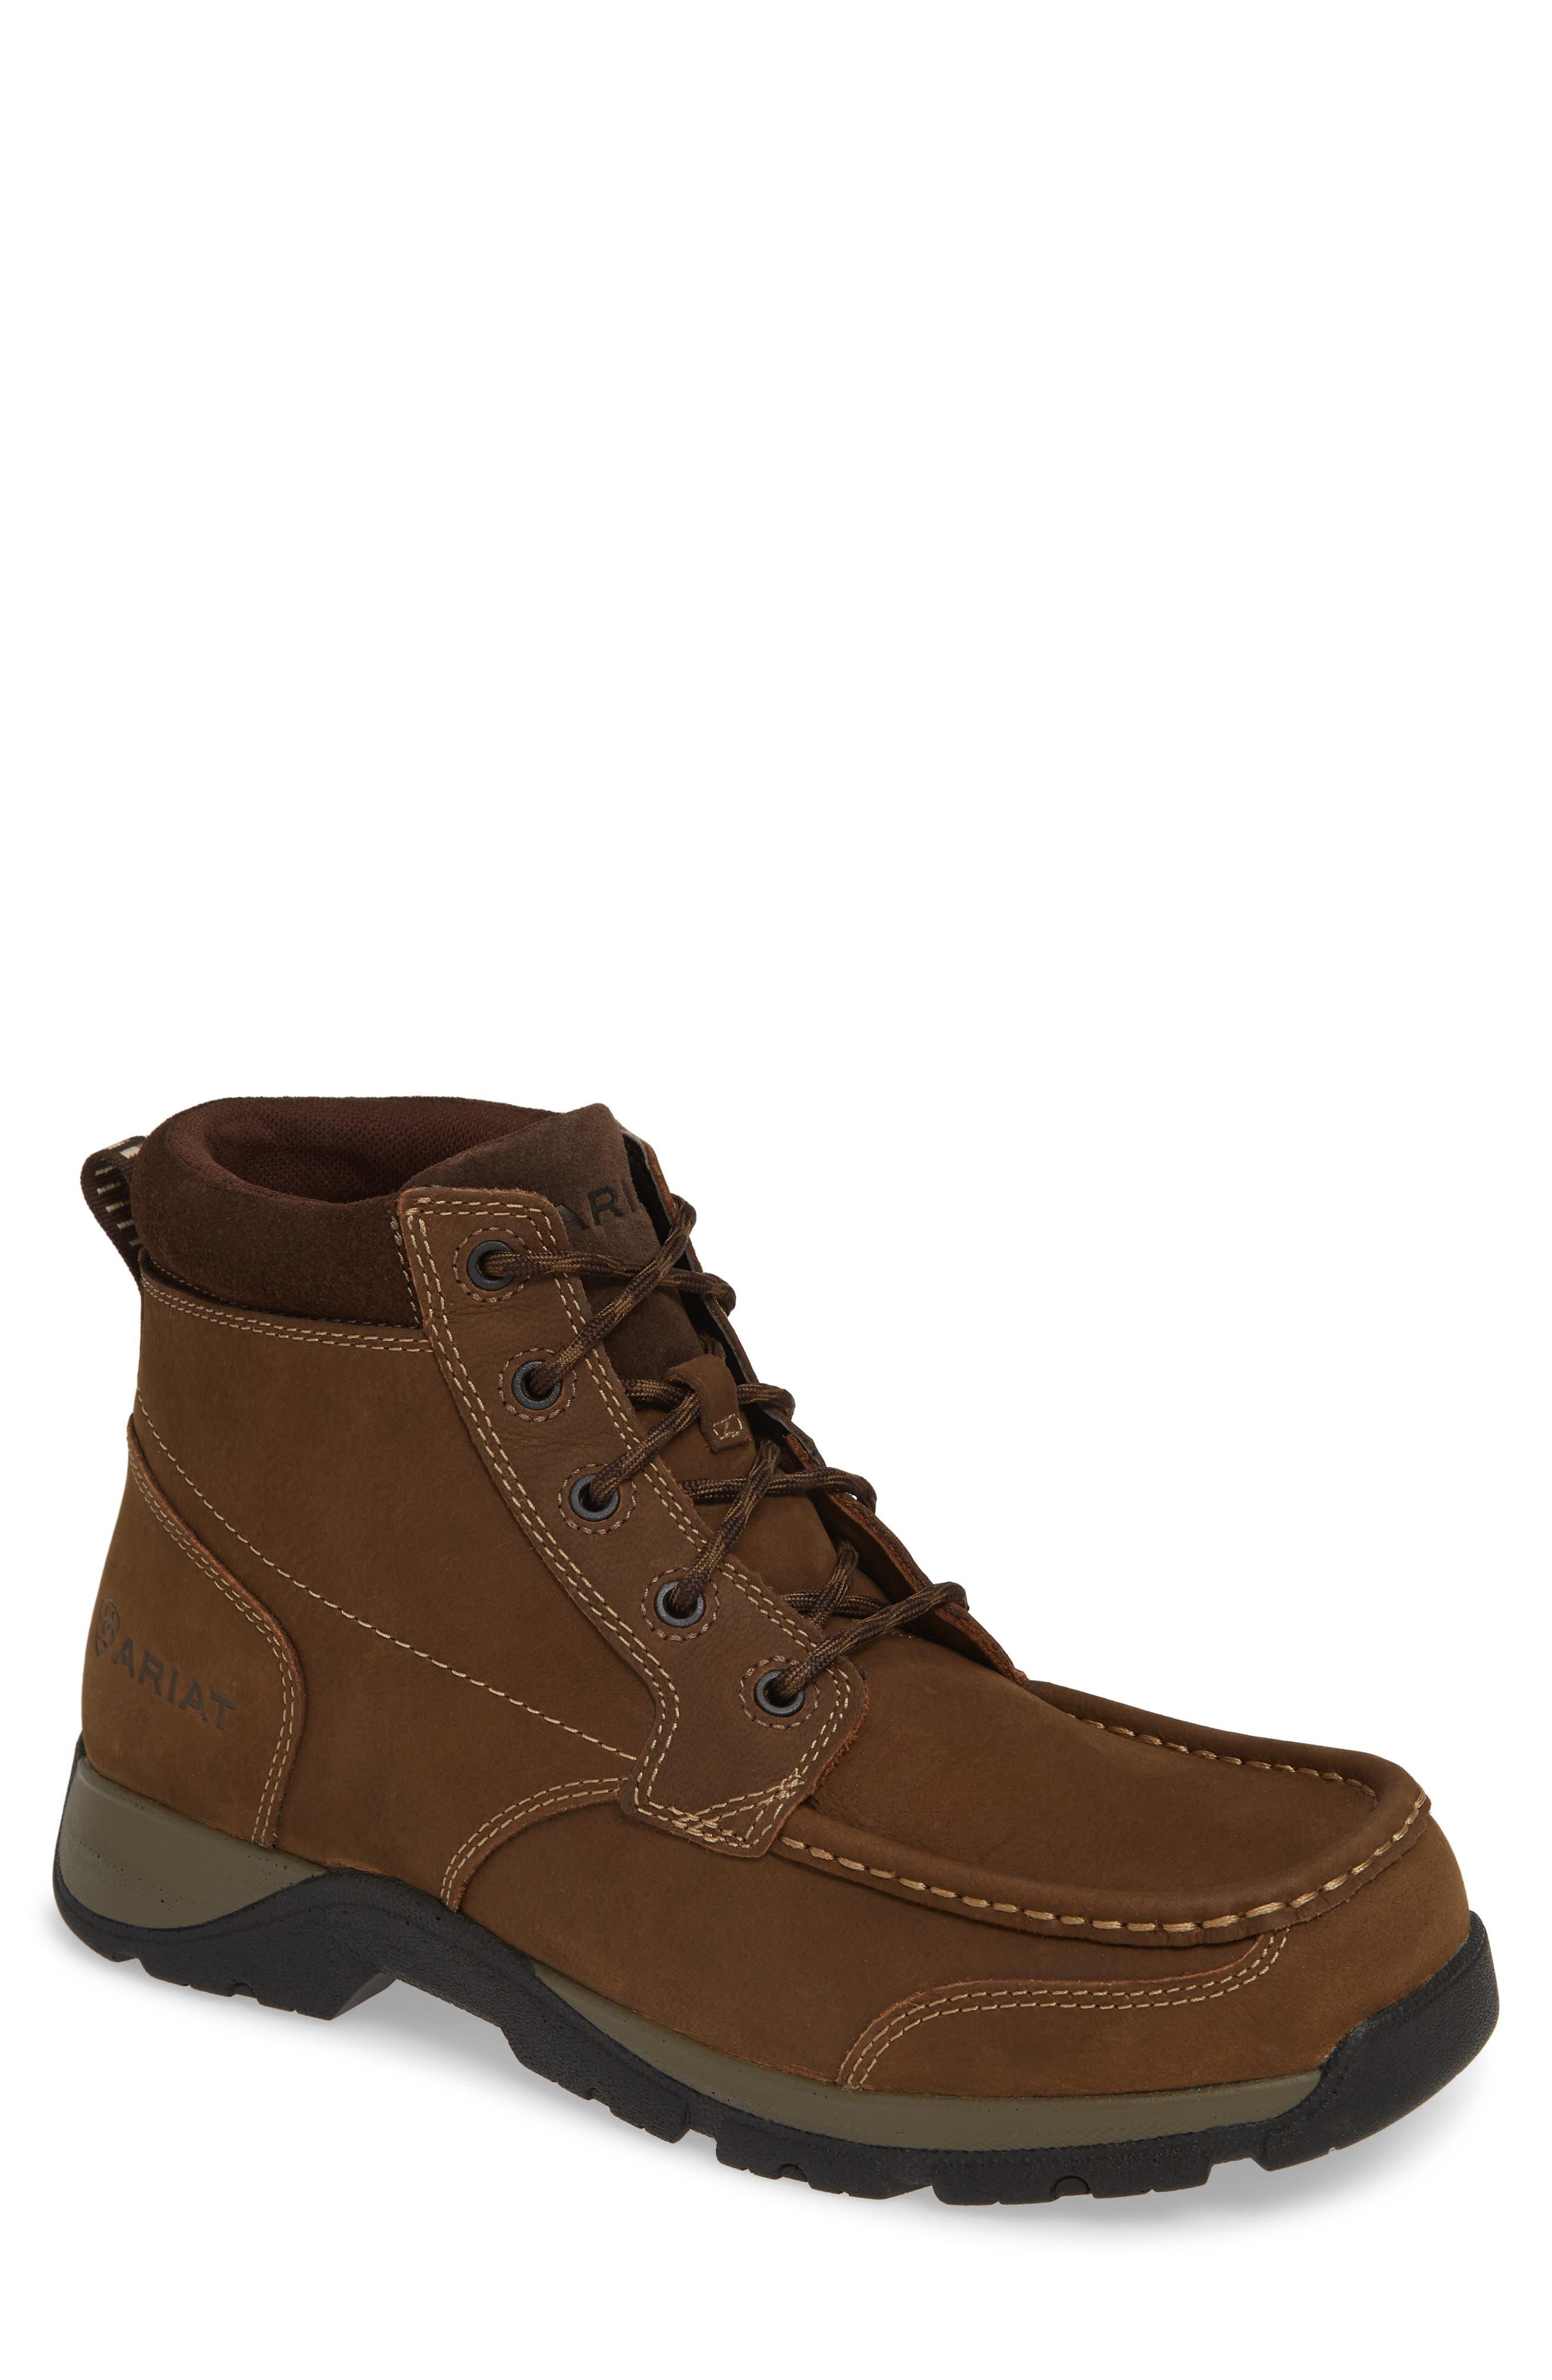 Ariat Edge Moc Toe Boot W - Brown